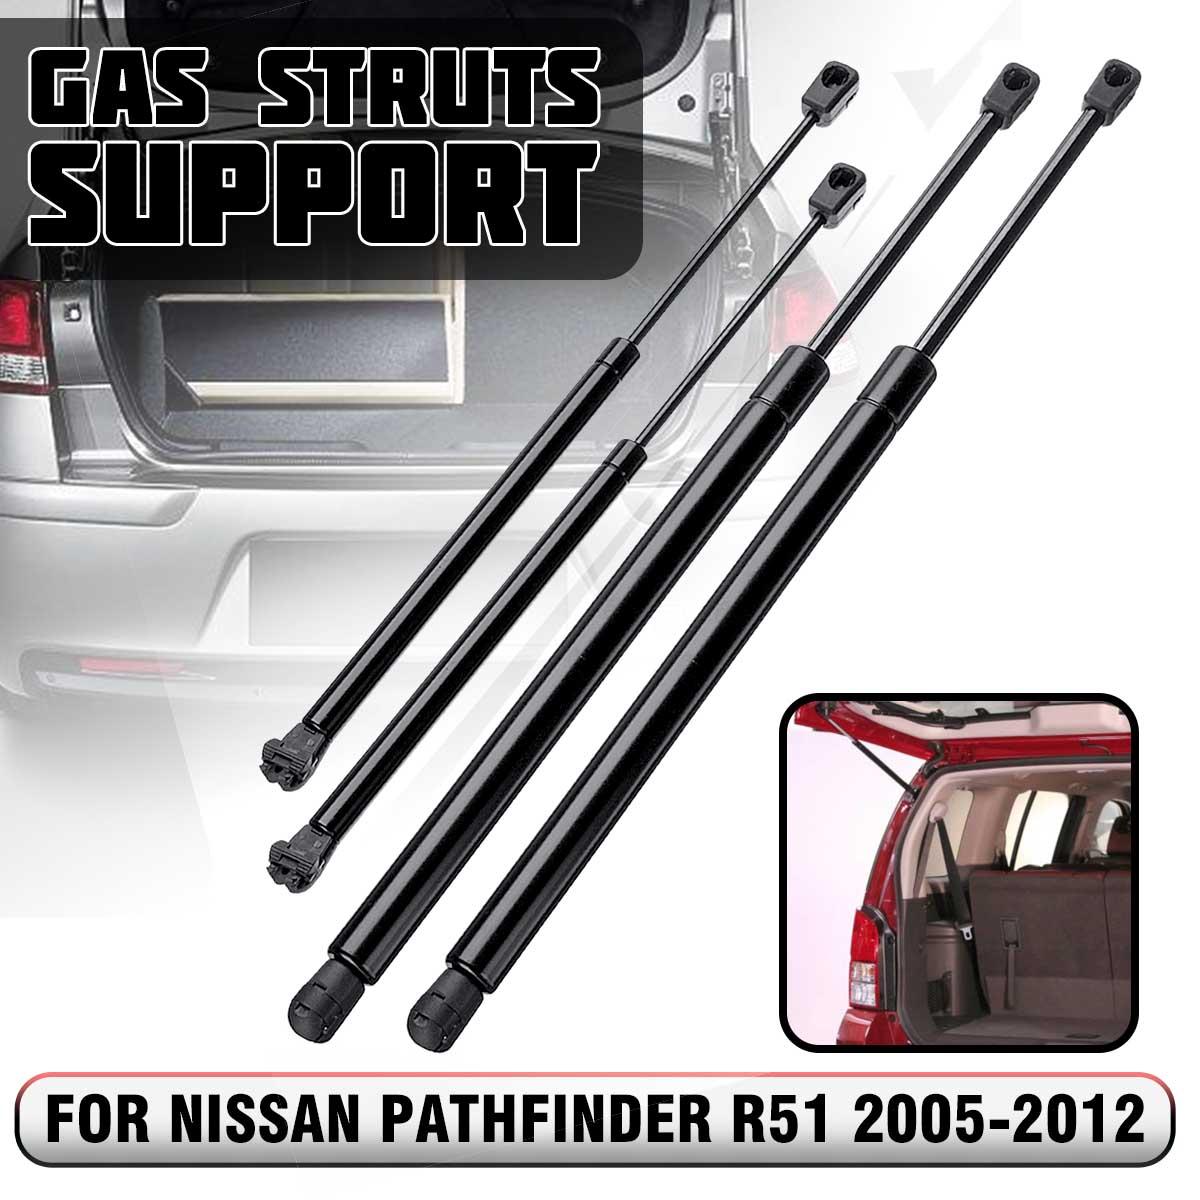 4pcs ด้านหลัง Tailgate BOOT แก๊ส Struts รองรับบาร์สำหรับ Nissan Pathfinder R51 2005 2006 2007 2008 2009 2010 2011 2012